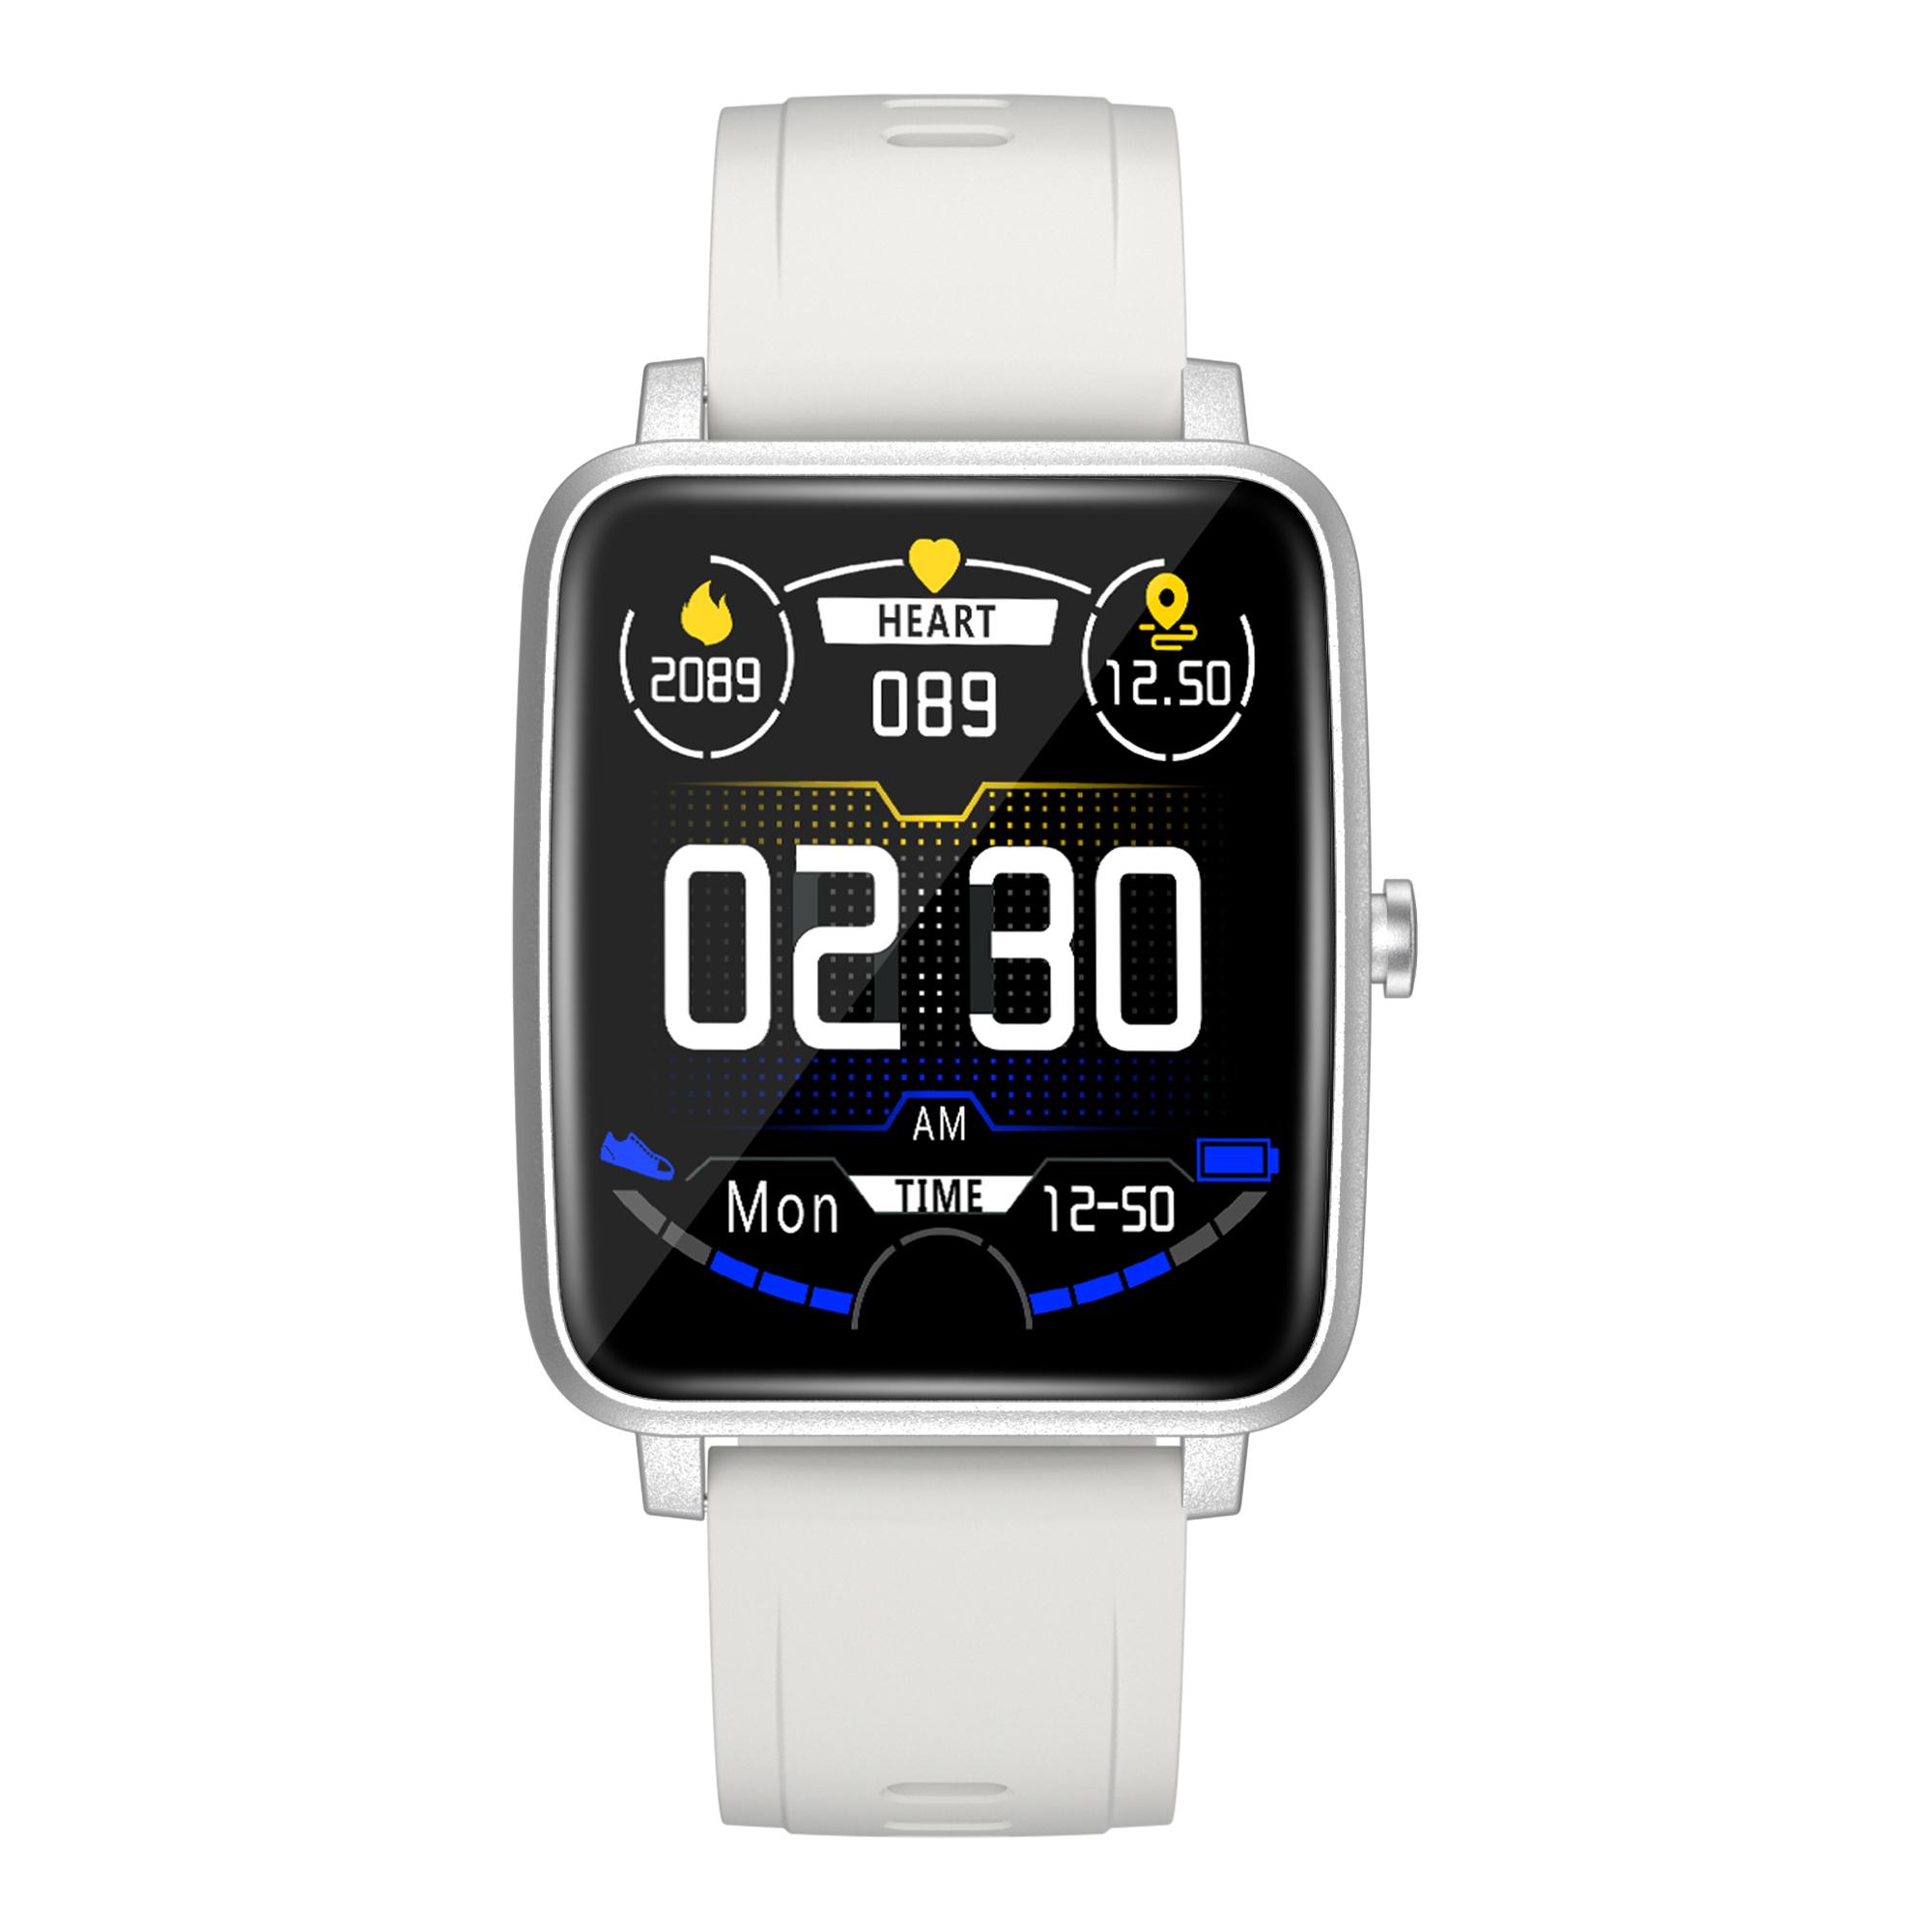 V10 Smart Watch Bluetooth Sports Health Wristband Heart Rate Fitness Pedometer Smartwatch White